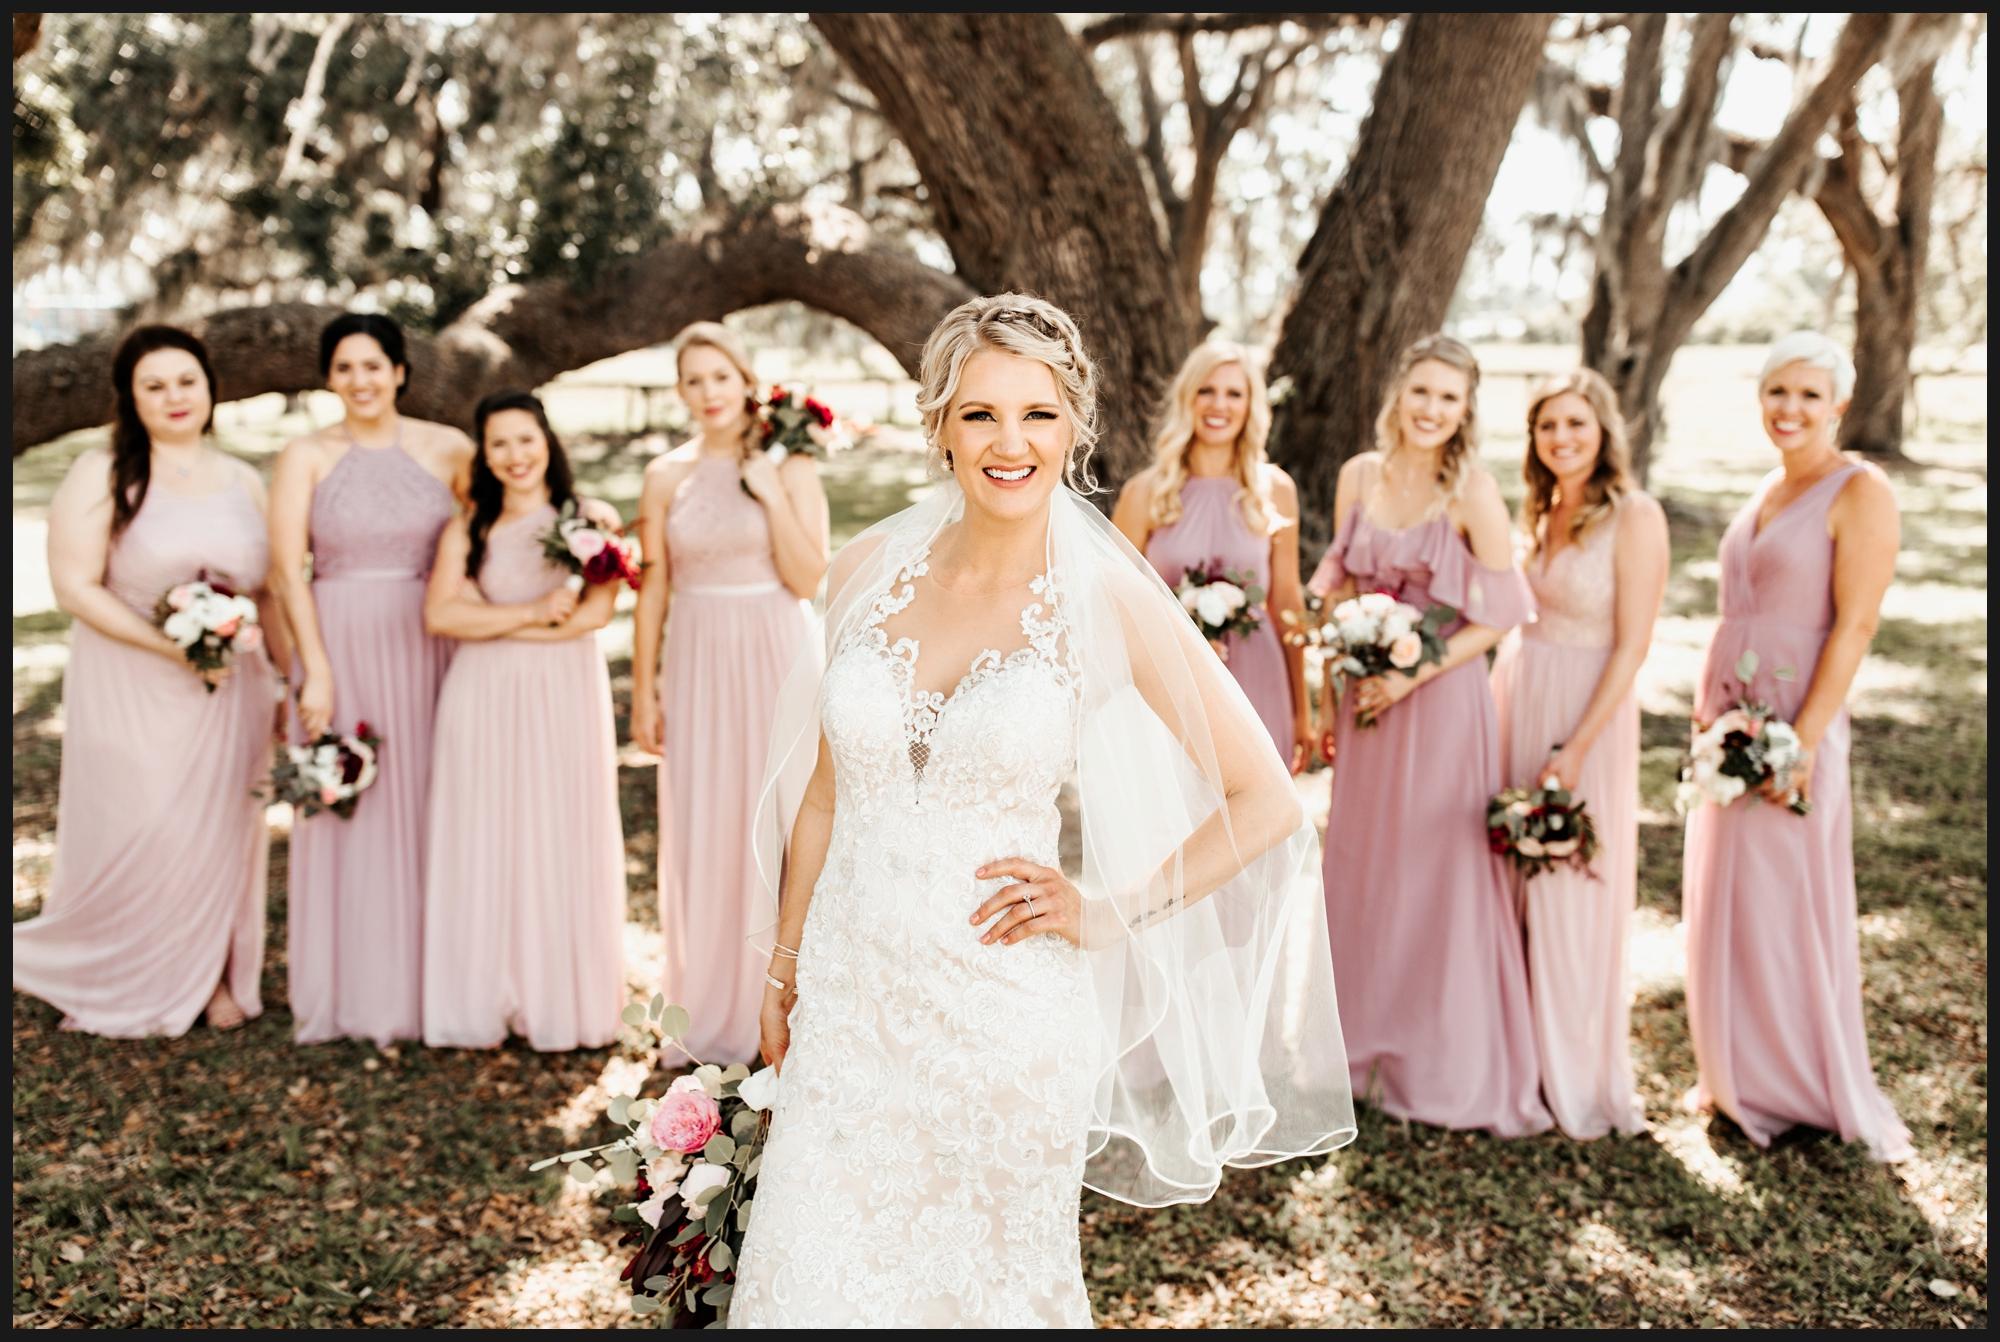 Orlando-Wedding-Photographer-destination-wedding-photographer-florida-wedding-photographer-hawaii-wedding-photographer_0585.jpg